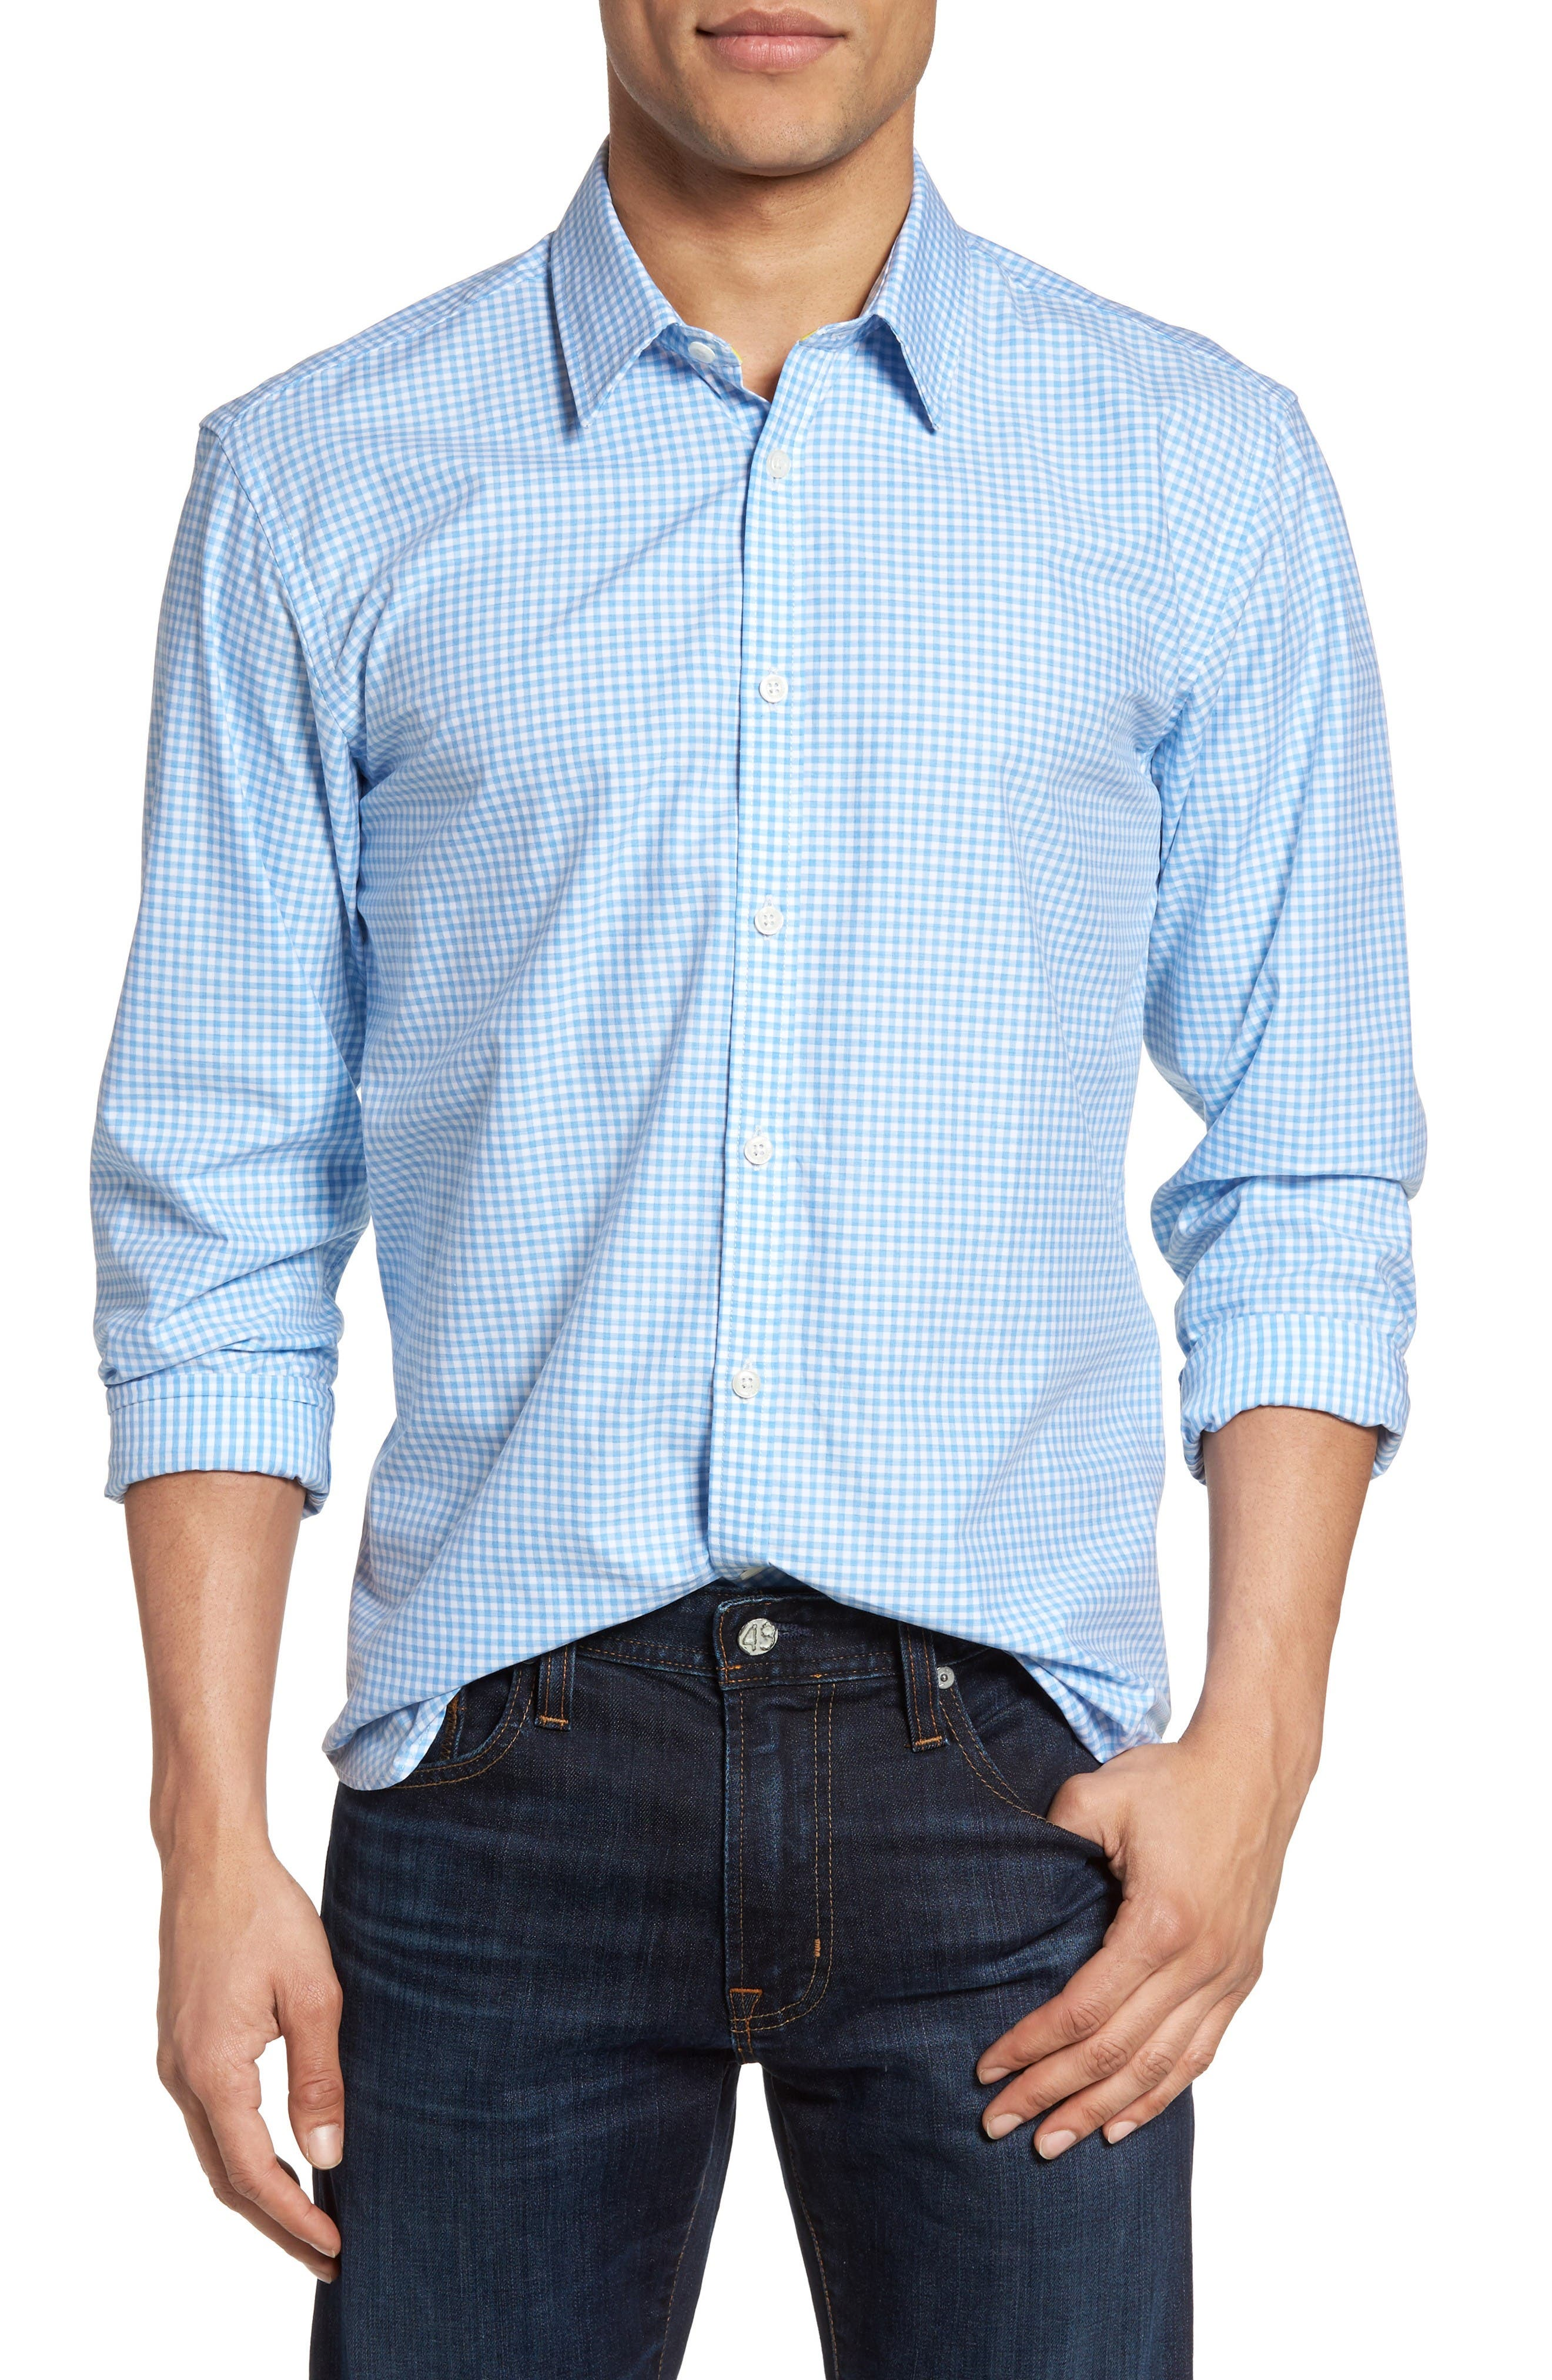 Jeremy Argyle Comfort Fit Gingham Sport Shirt